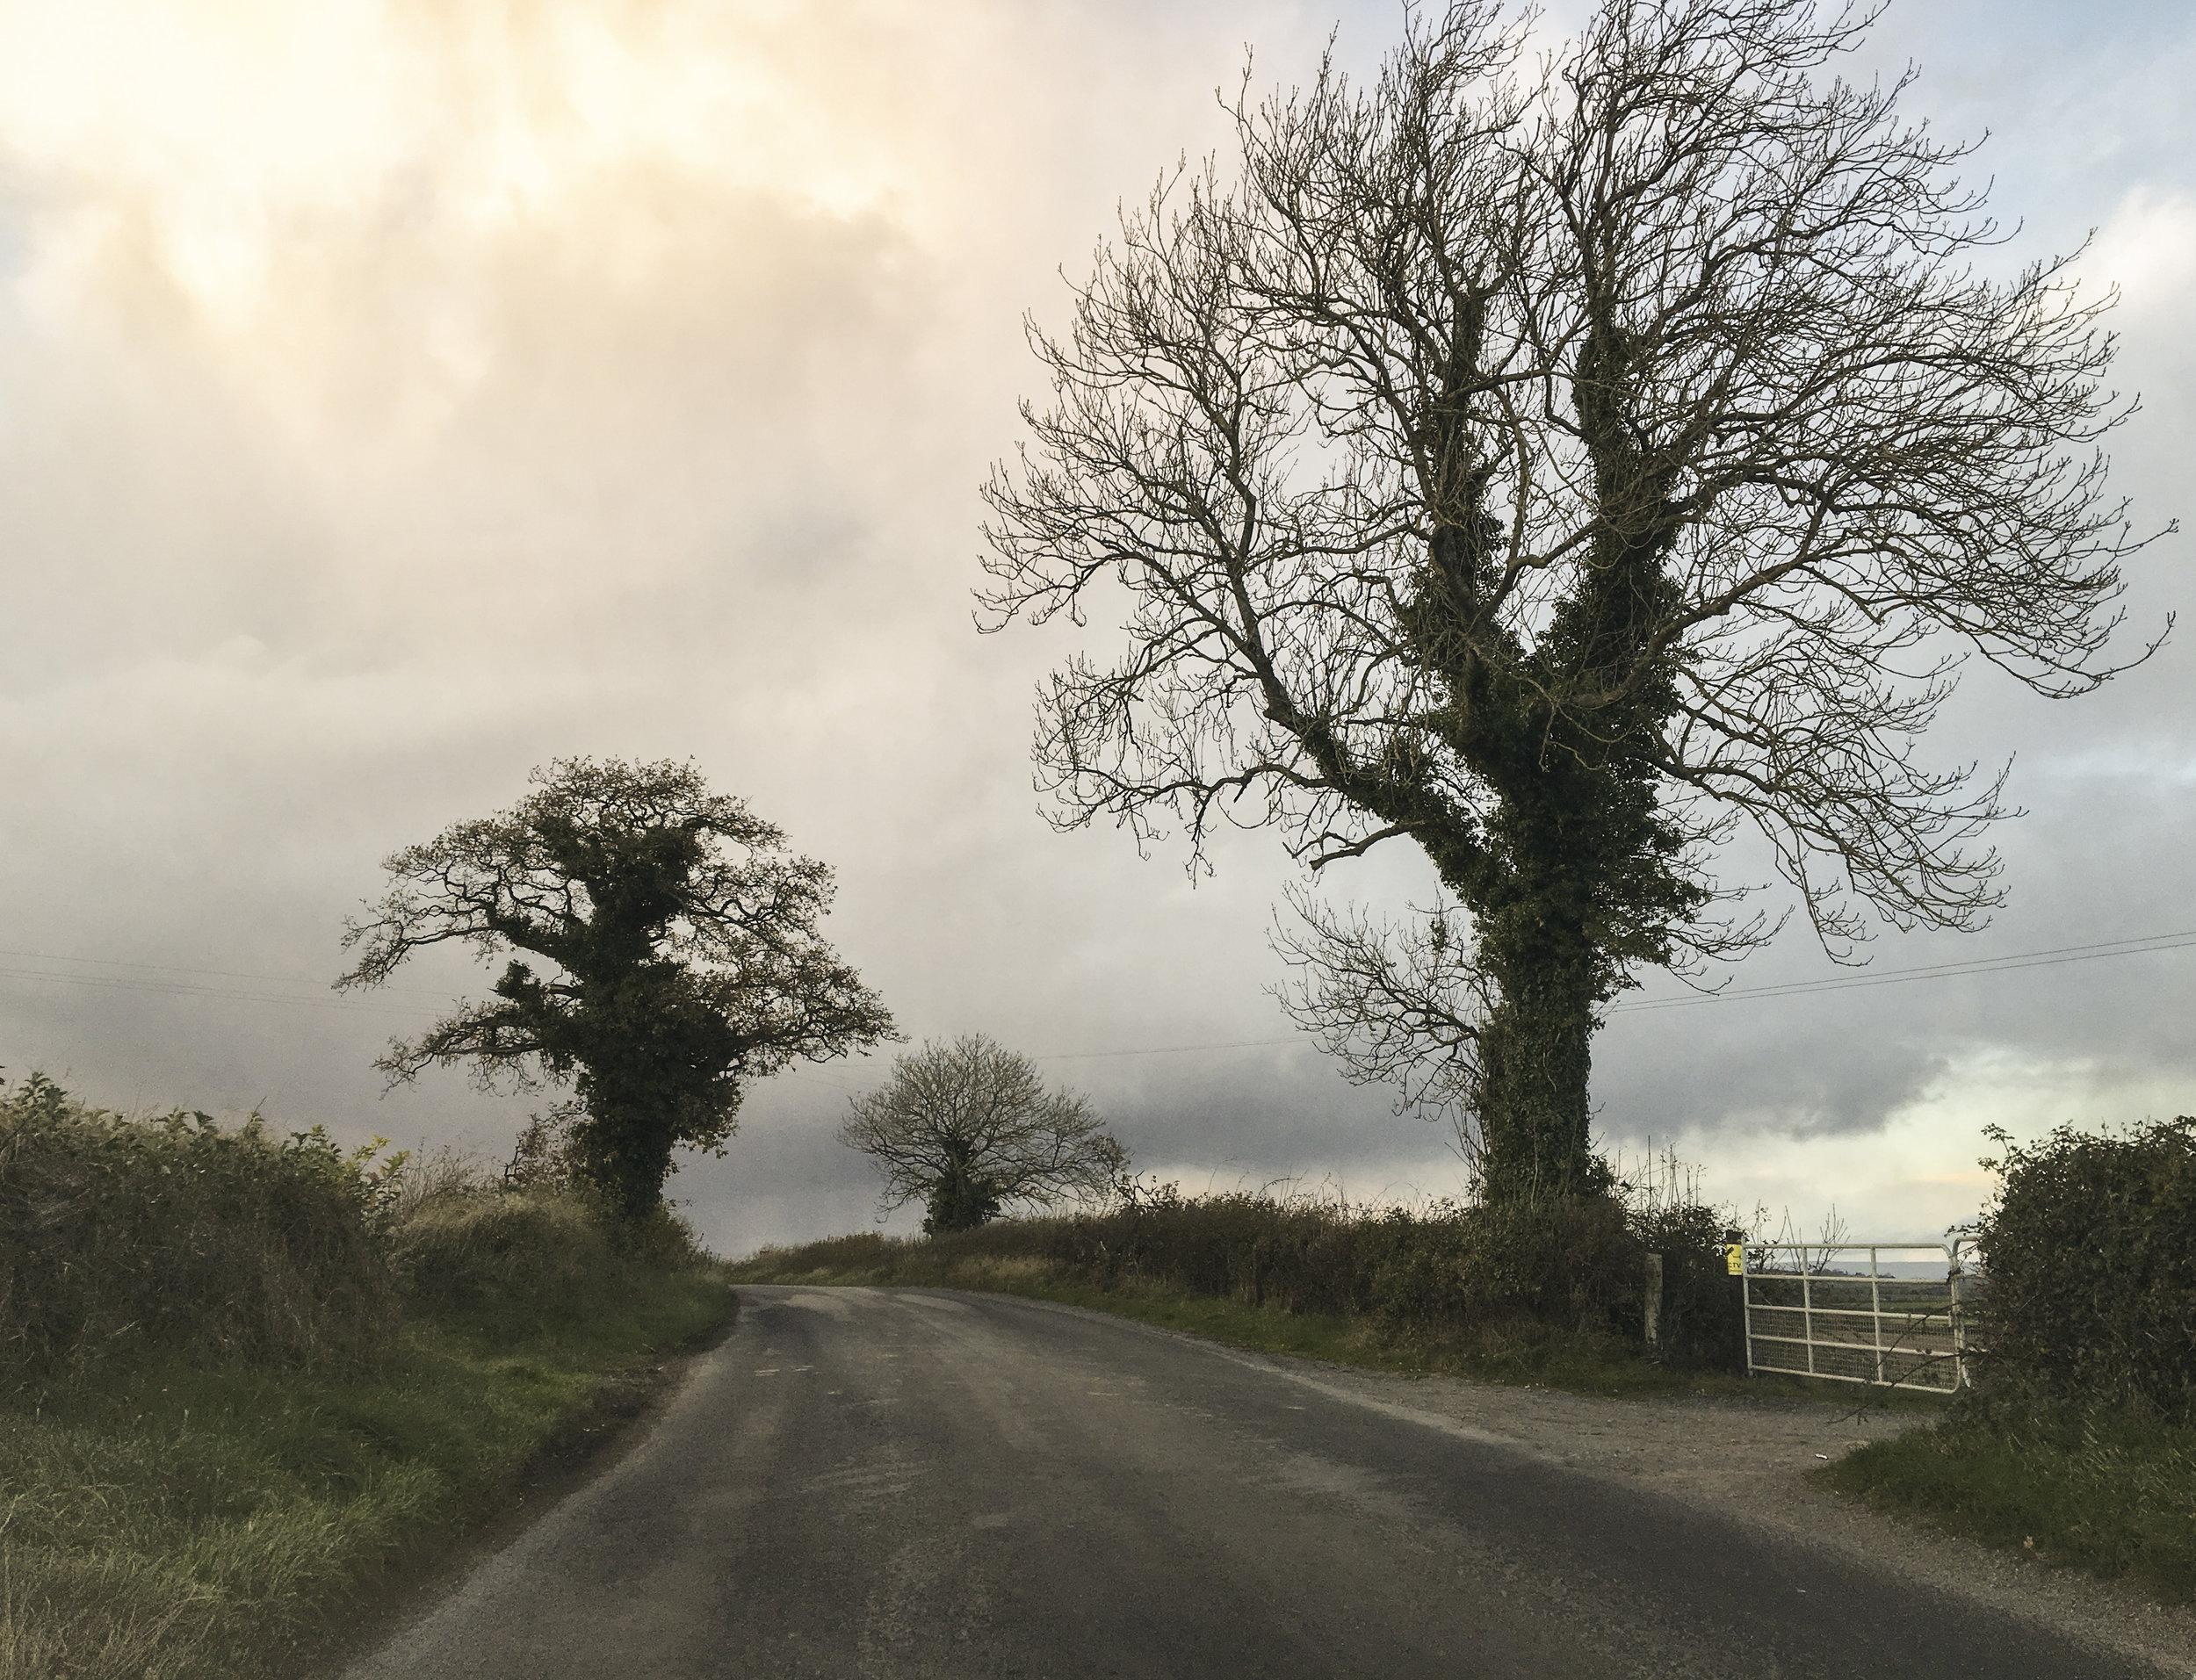 Kilchreest Road